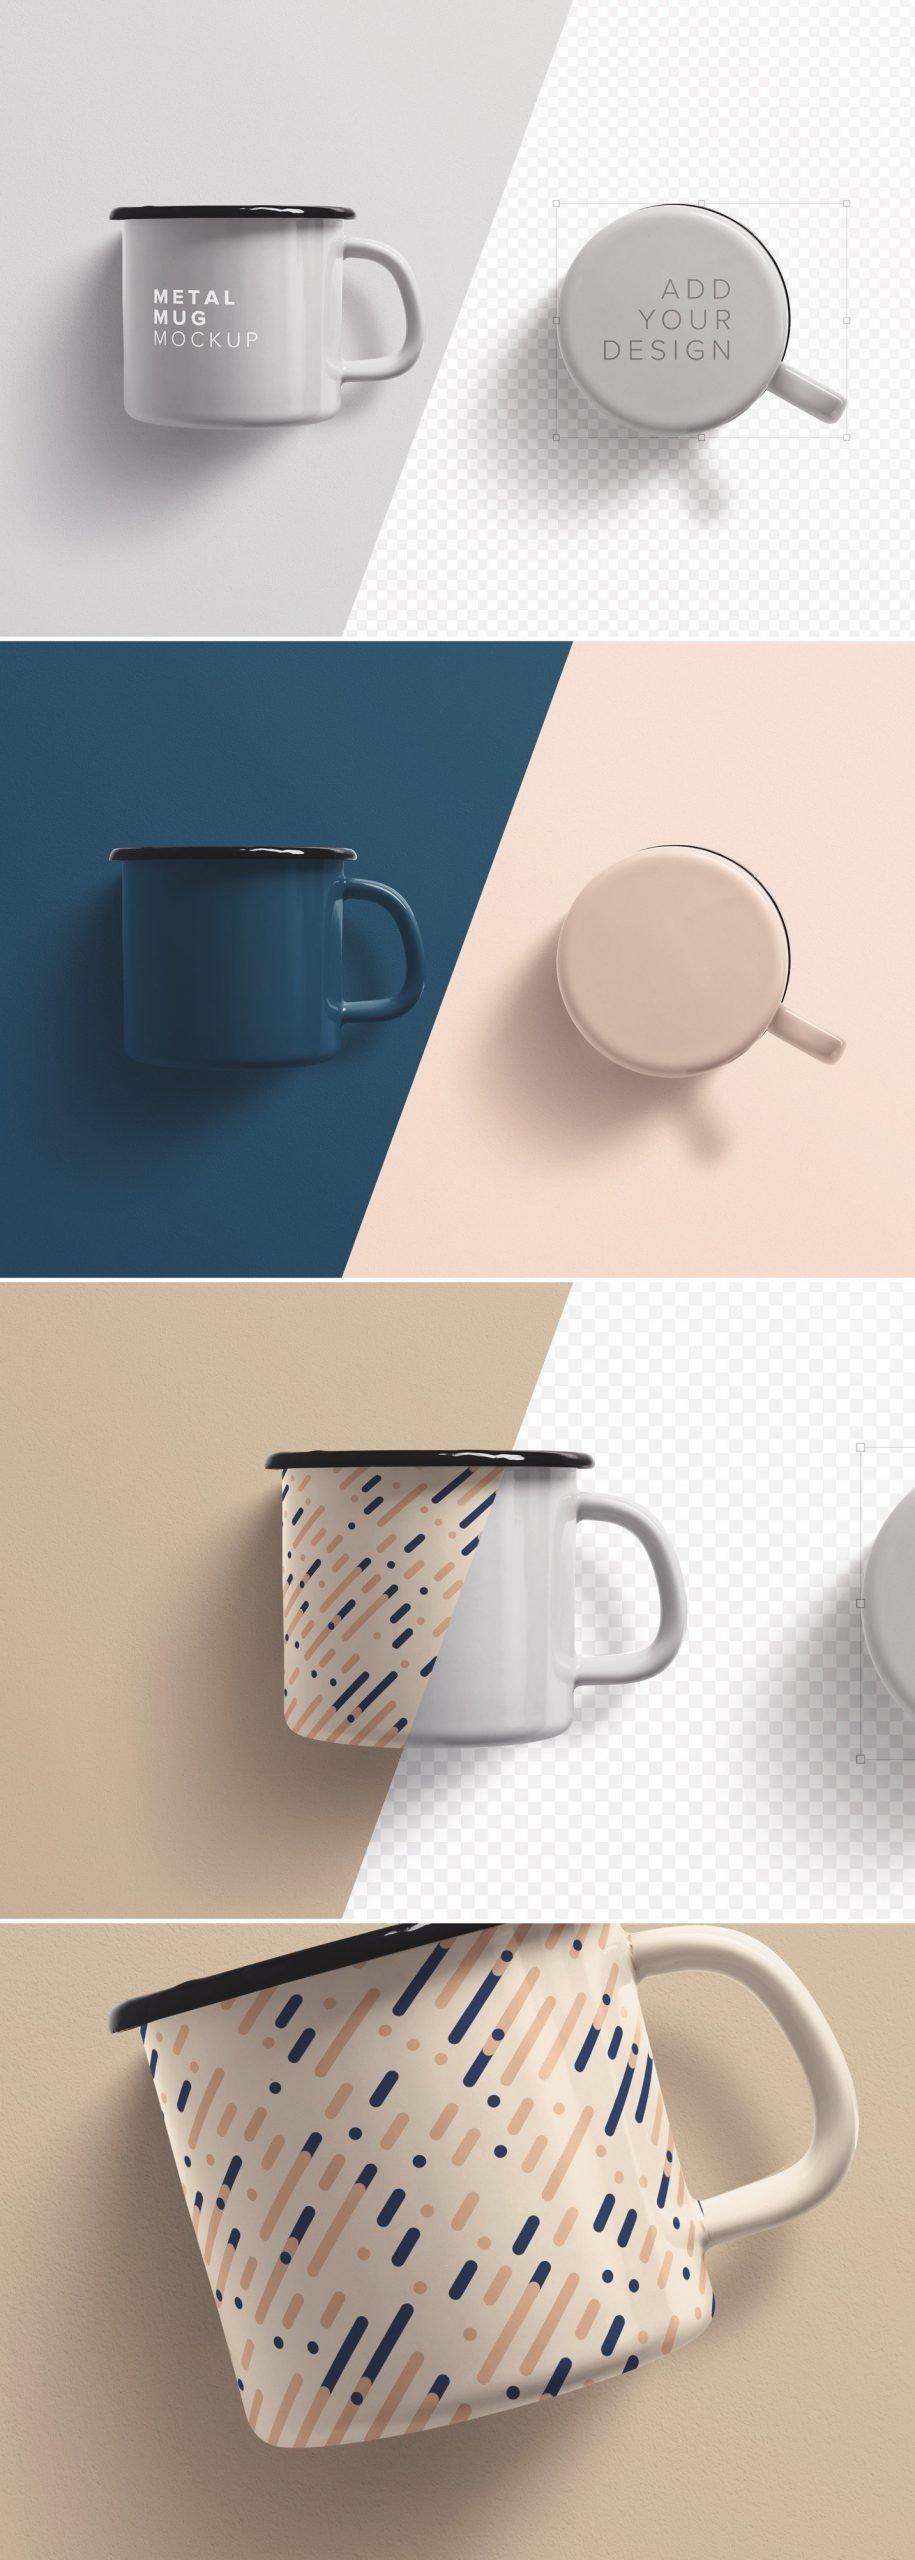 metal mug mockup preview 1 scaled